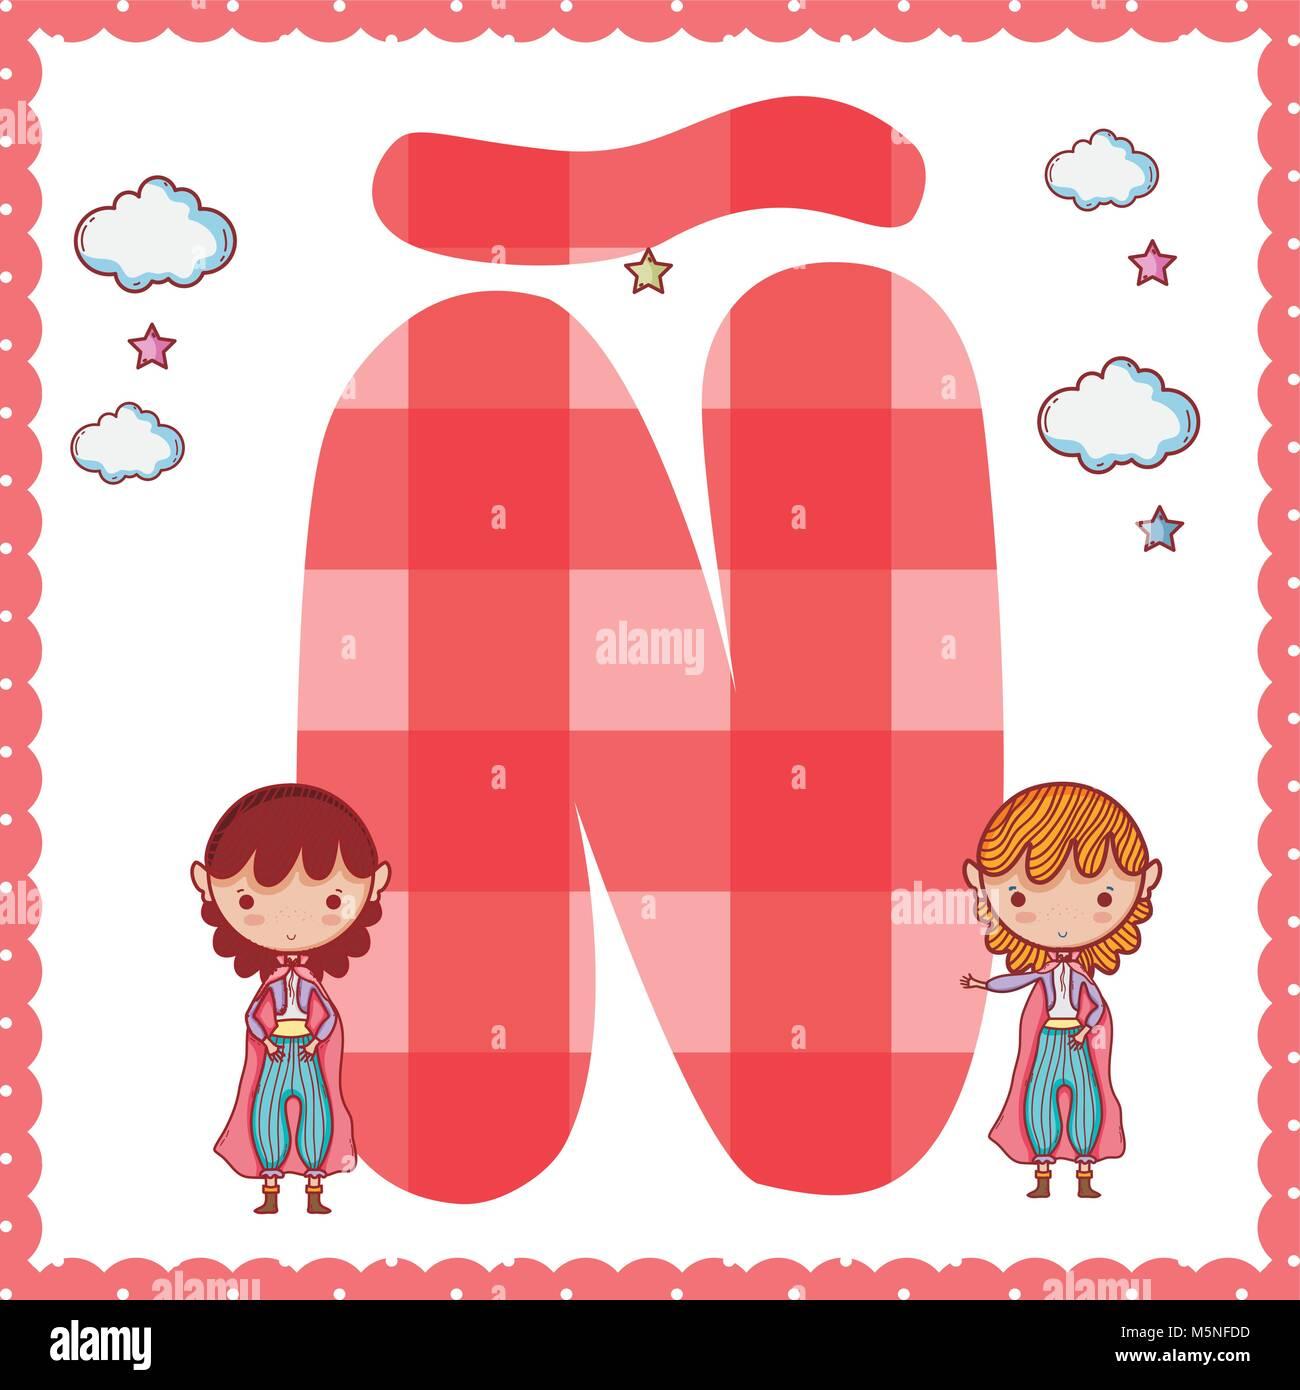 Cartoon Letter N Stock Photos & Cartoon Letter N Stock Images - Alamy